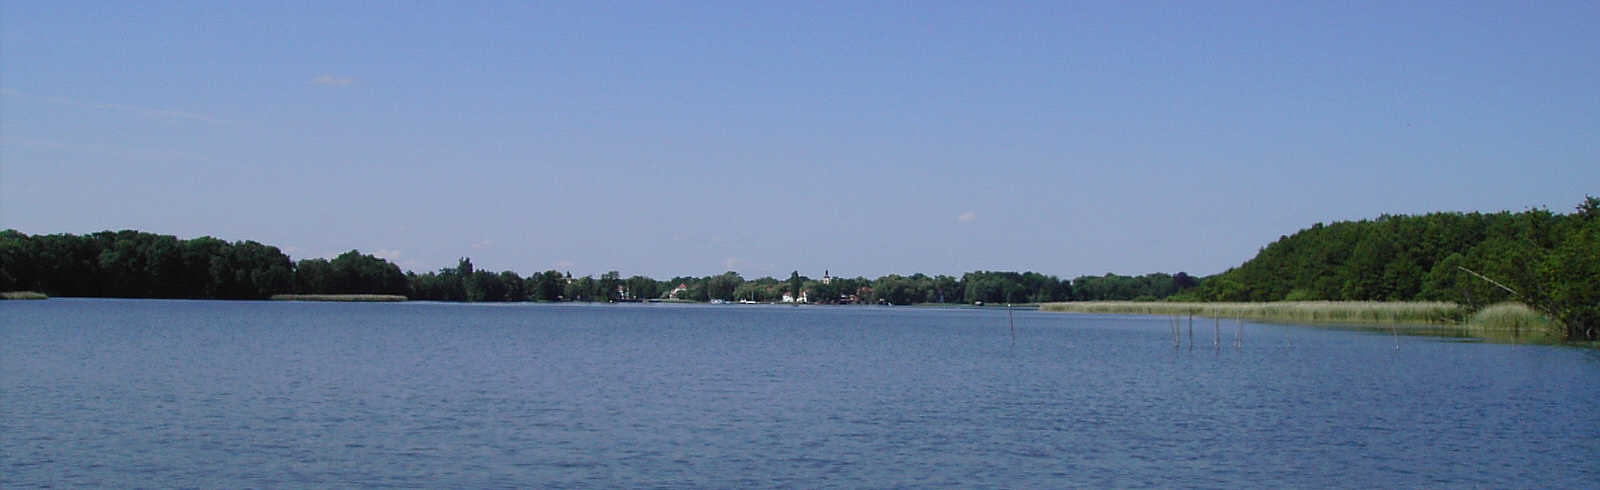 Blick auf Wustrau am Rupiner See